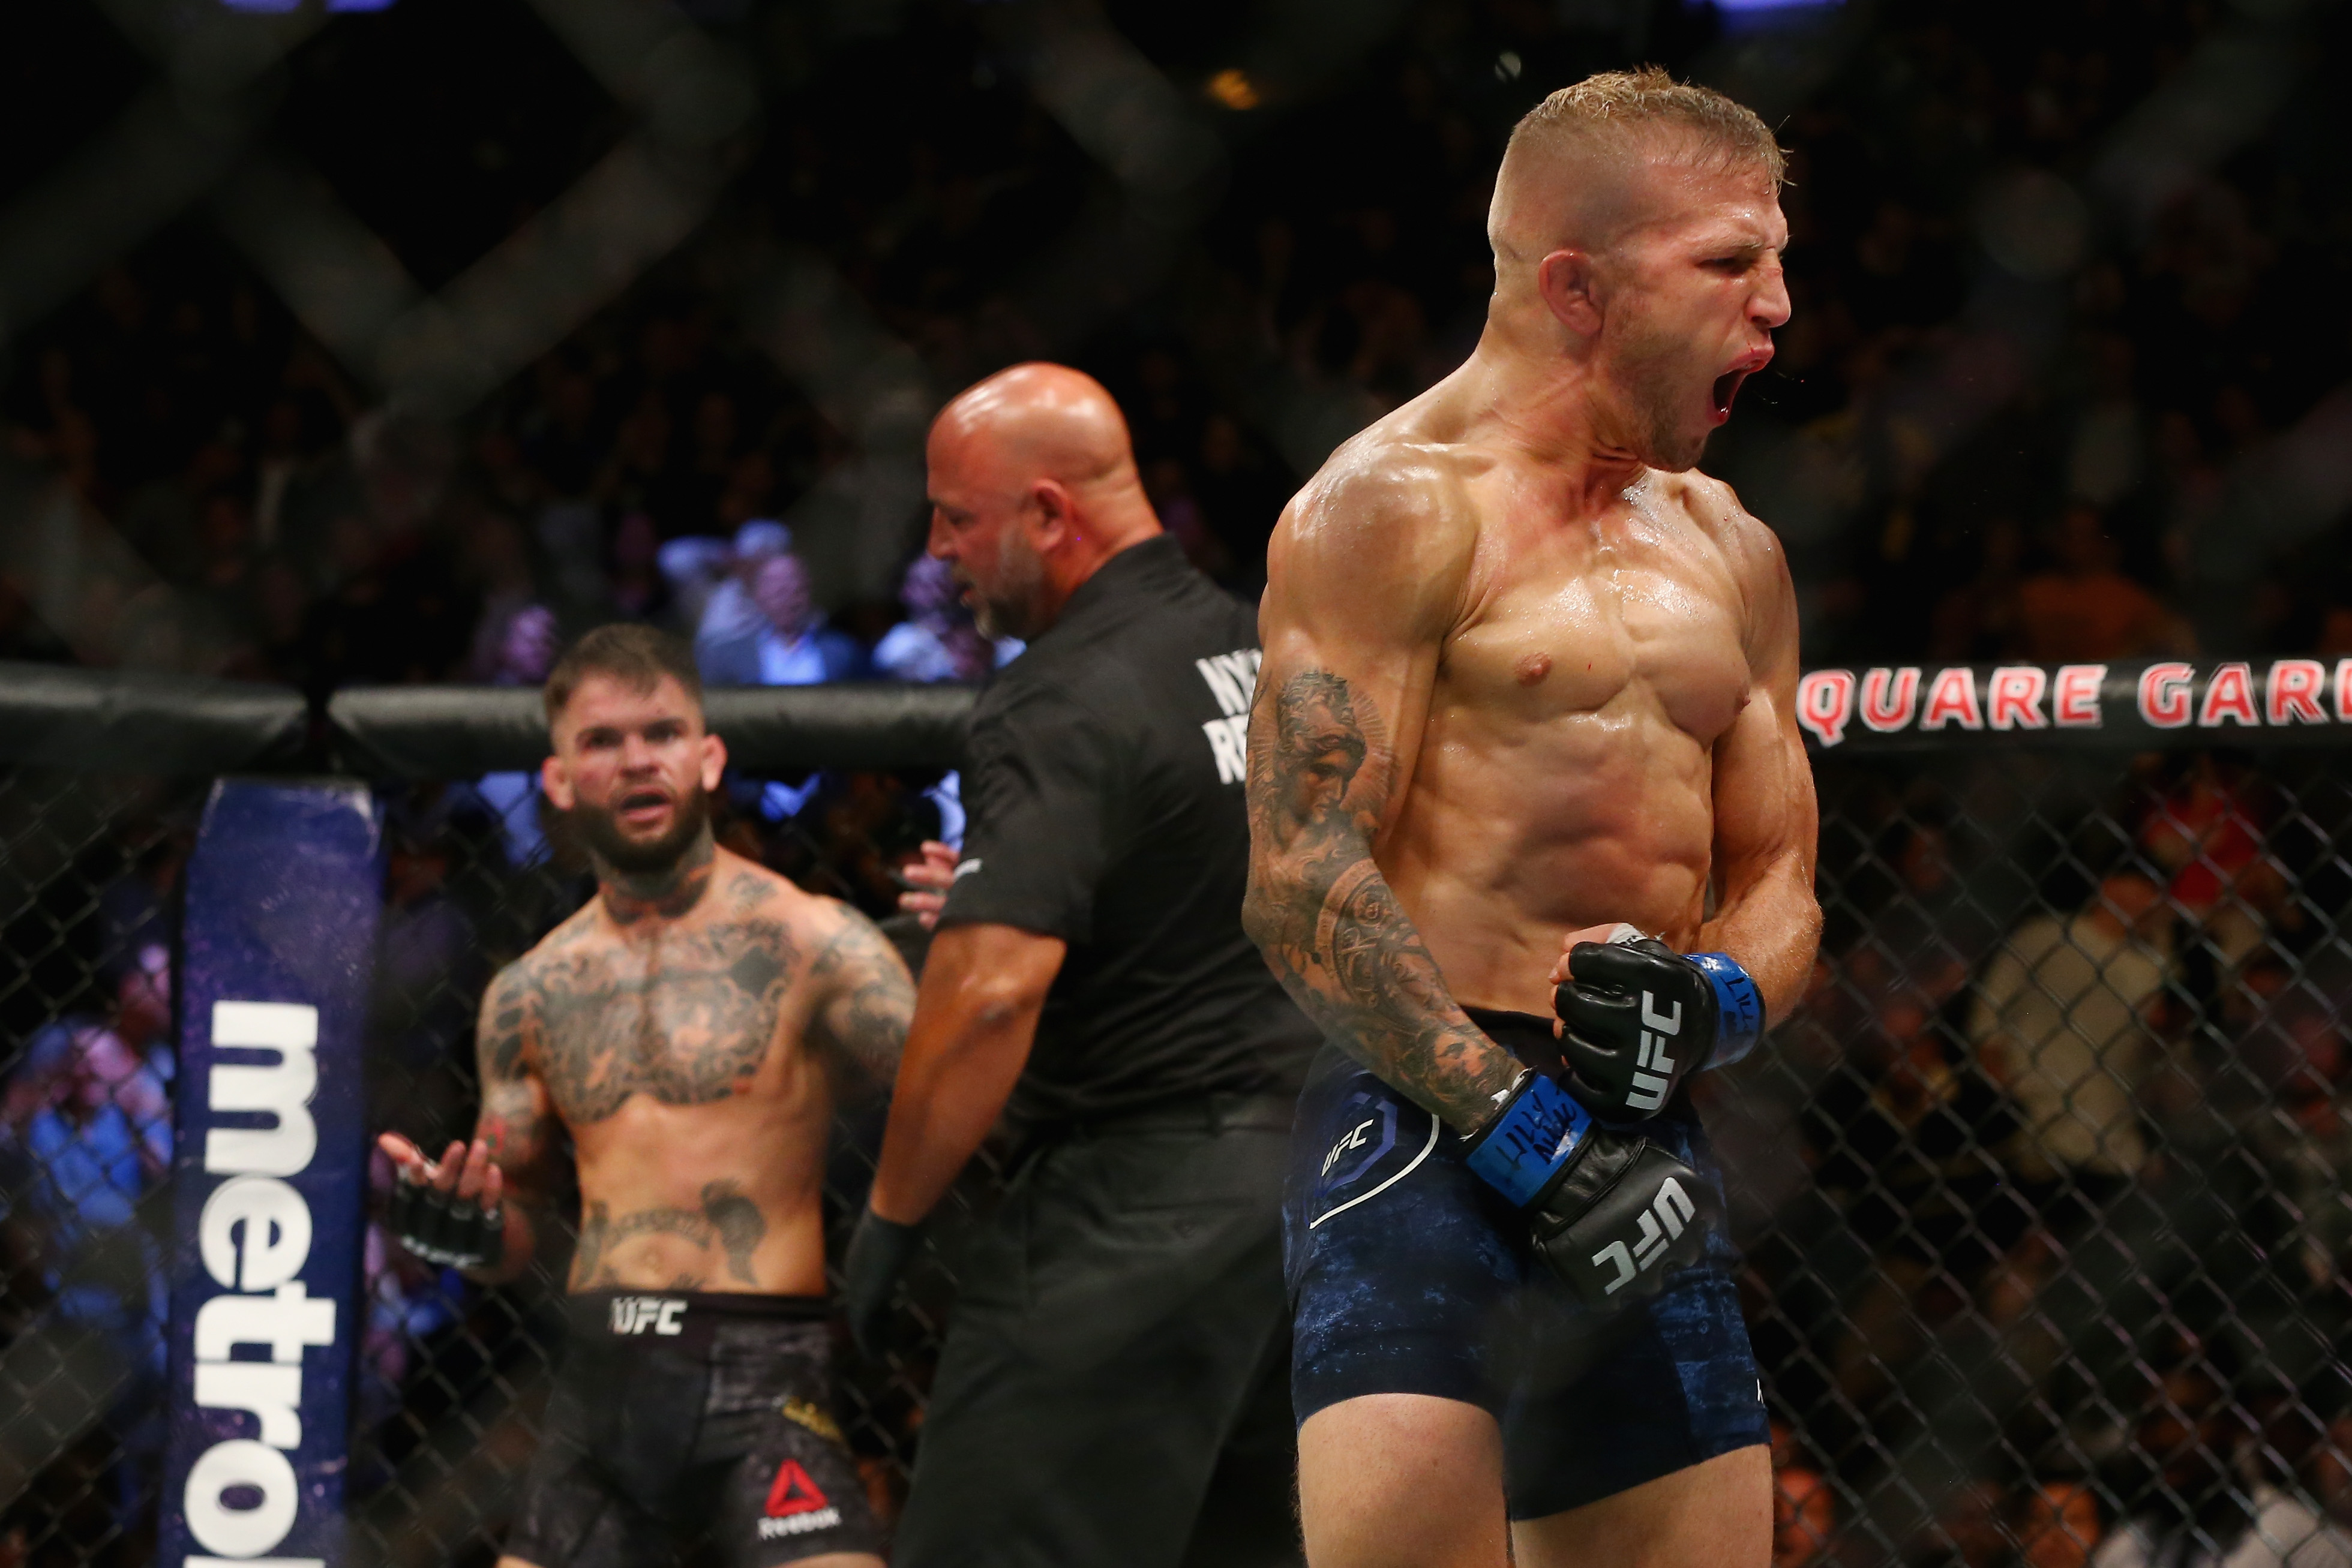 UFC 217: Garbrandt v Dillashaw